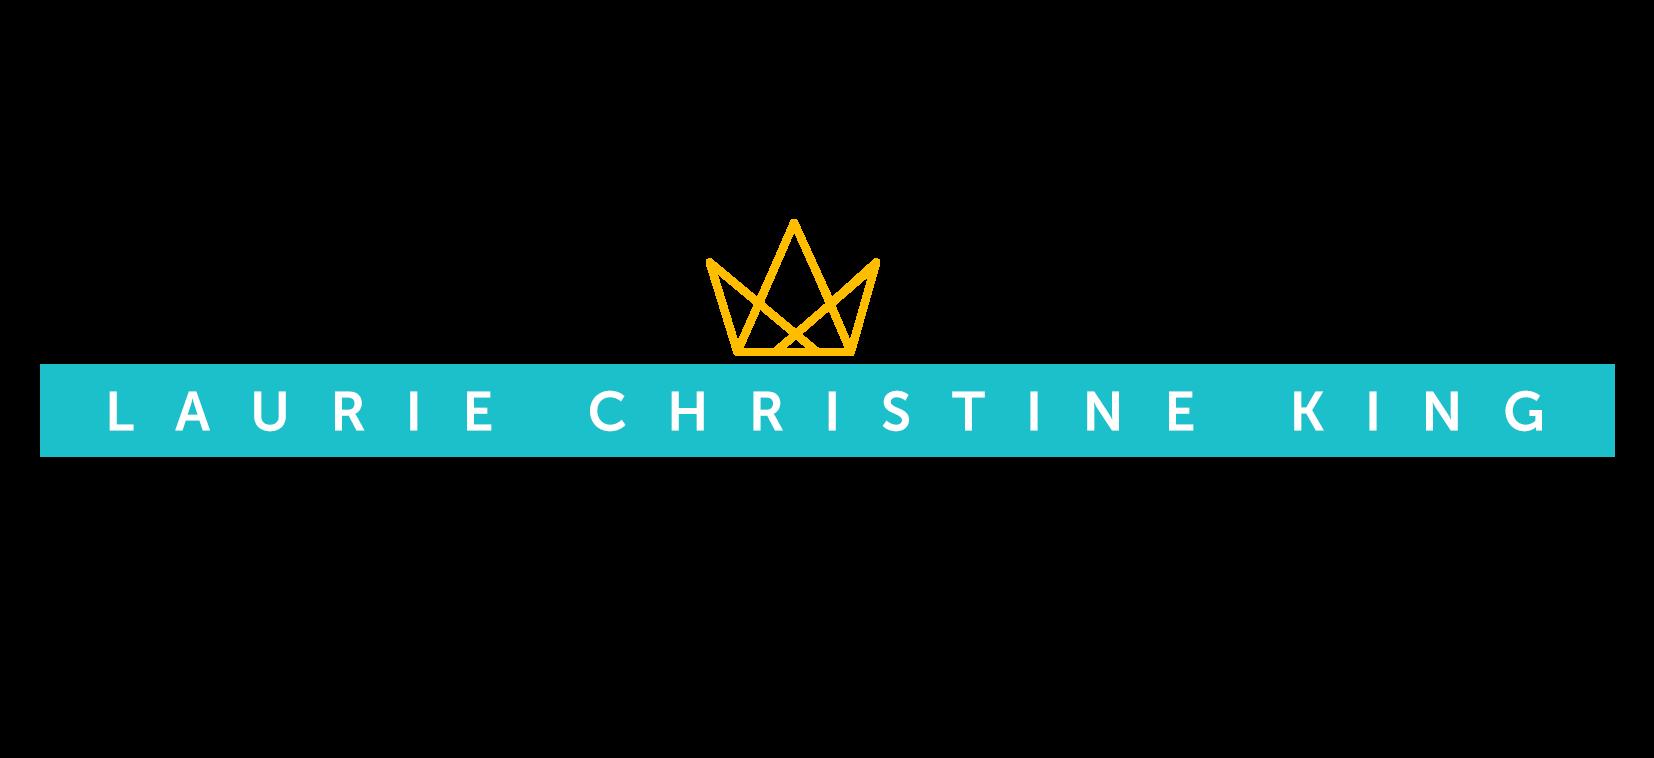 LaurieChristineKing.com